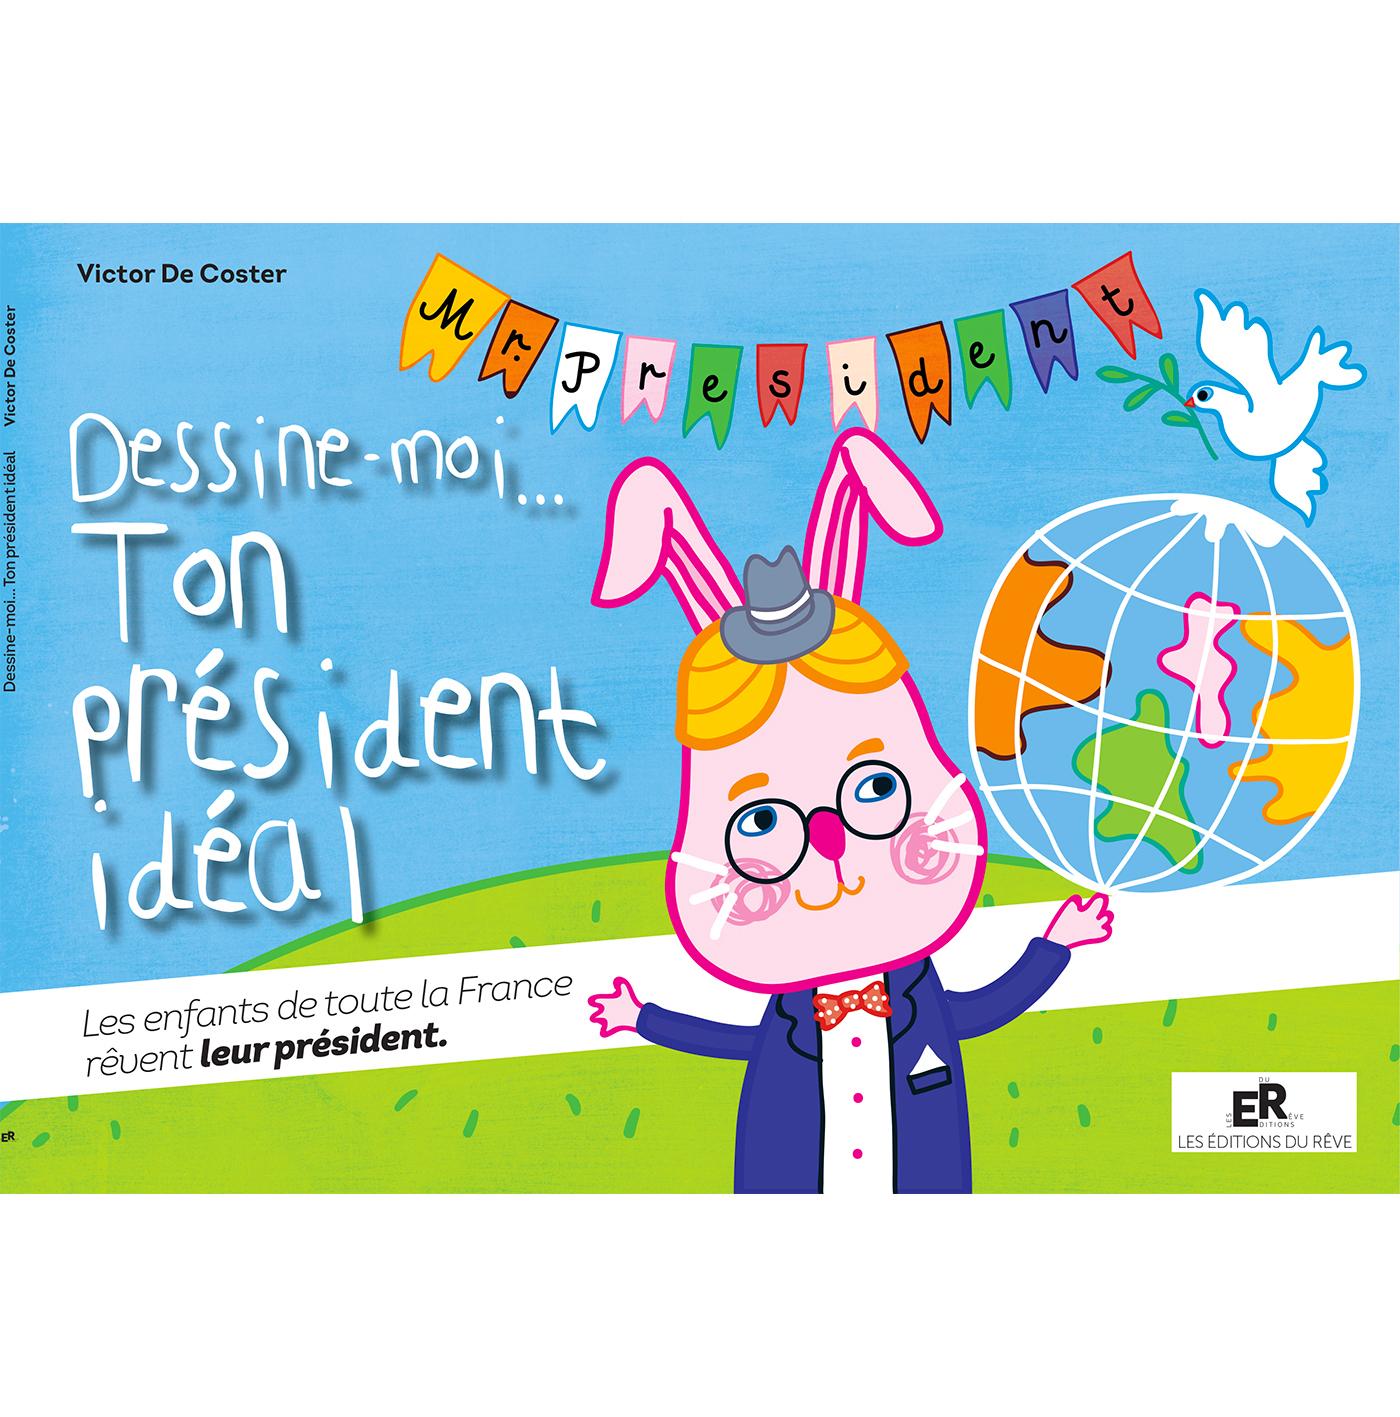 DESSINE-MOI... TON PRESIDENT IDEAL